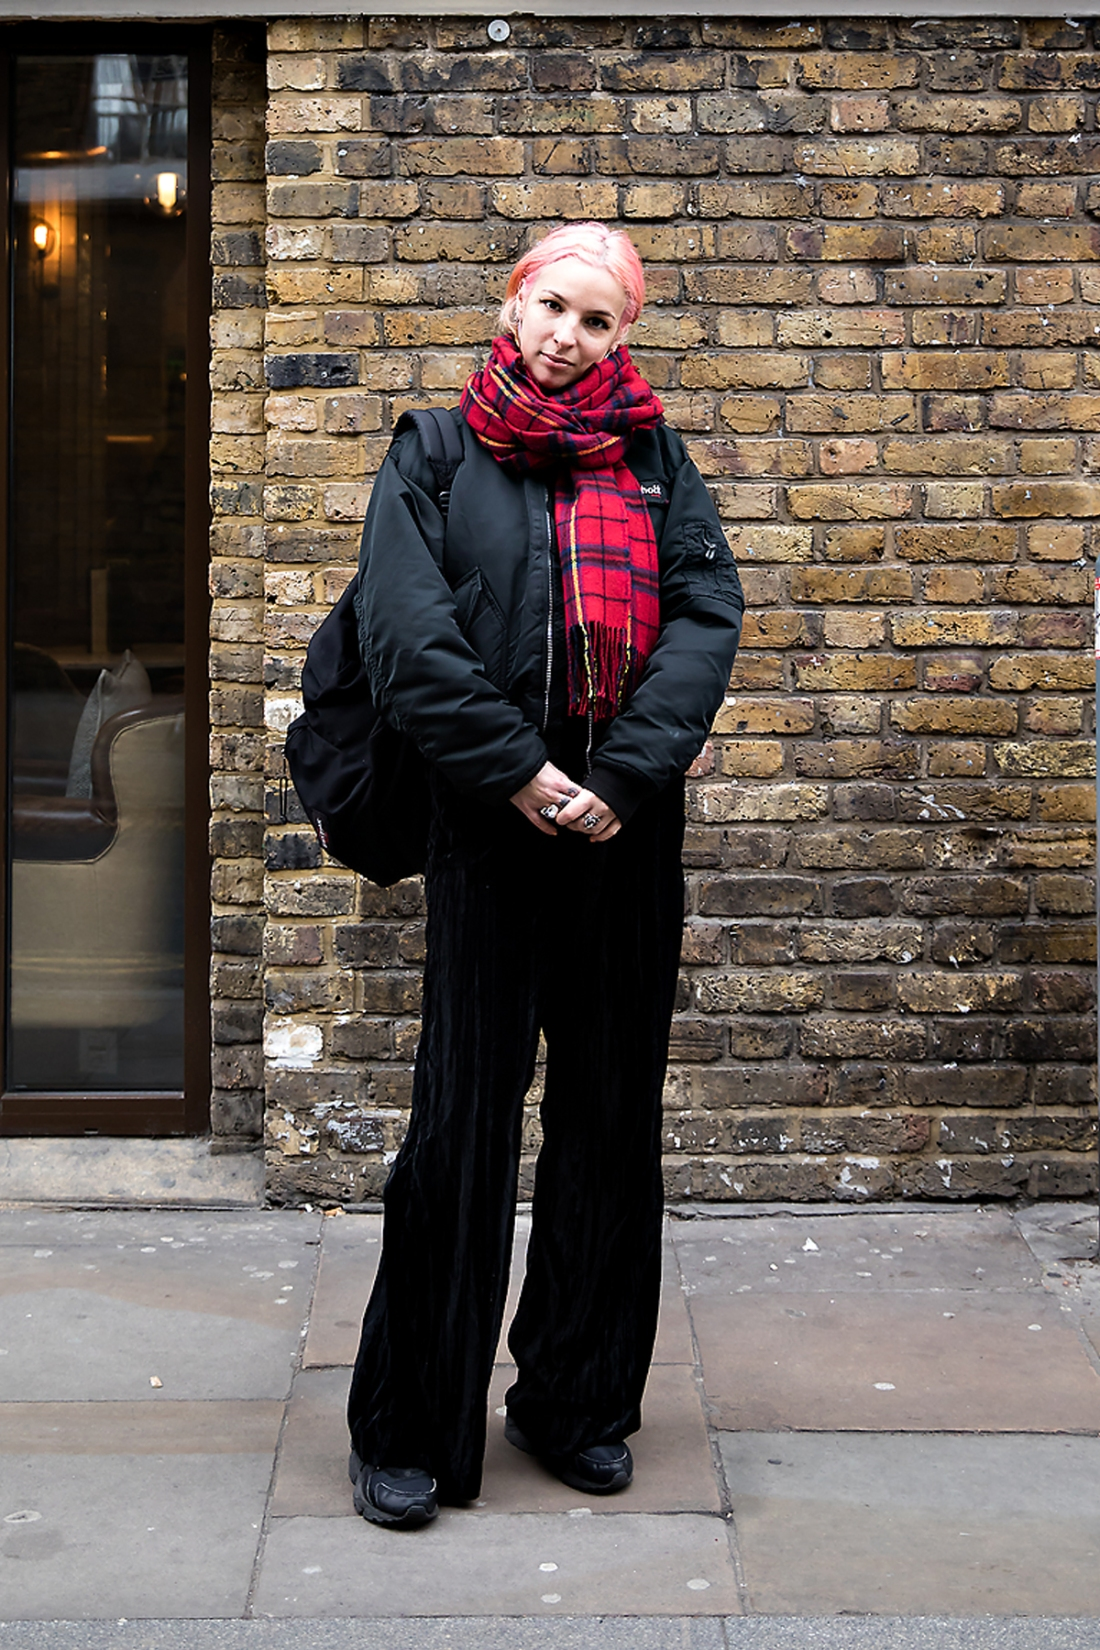 Billie, Street Fashion 2017 in London